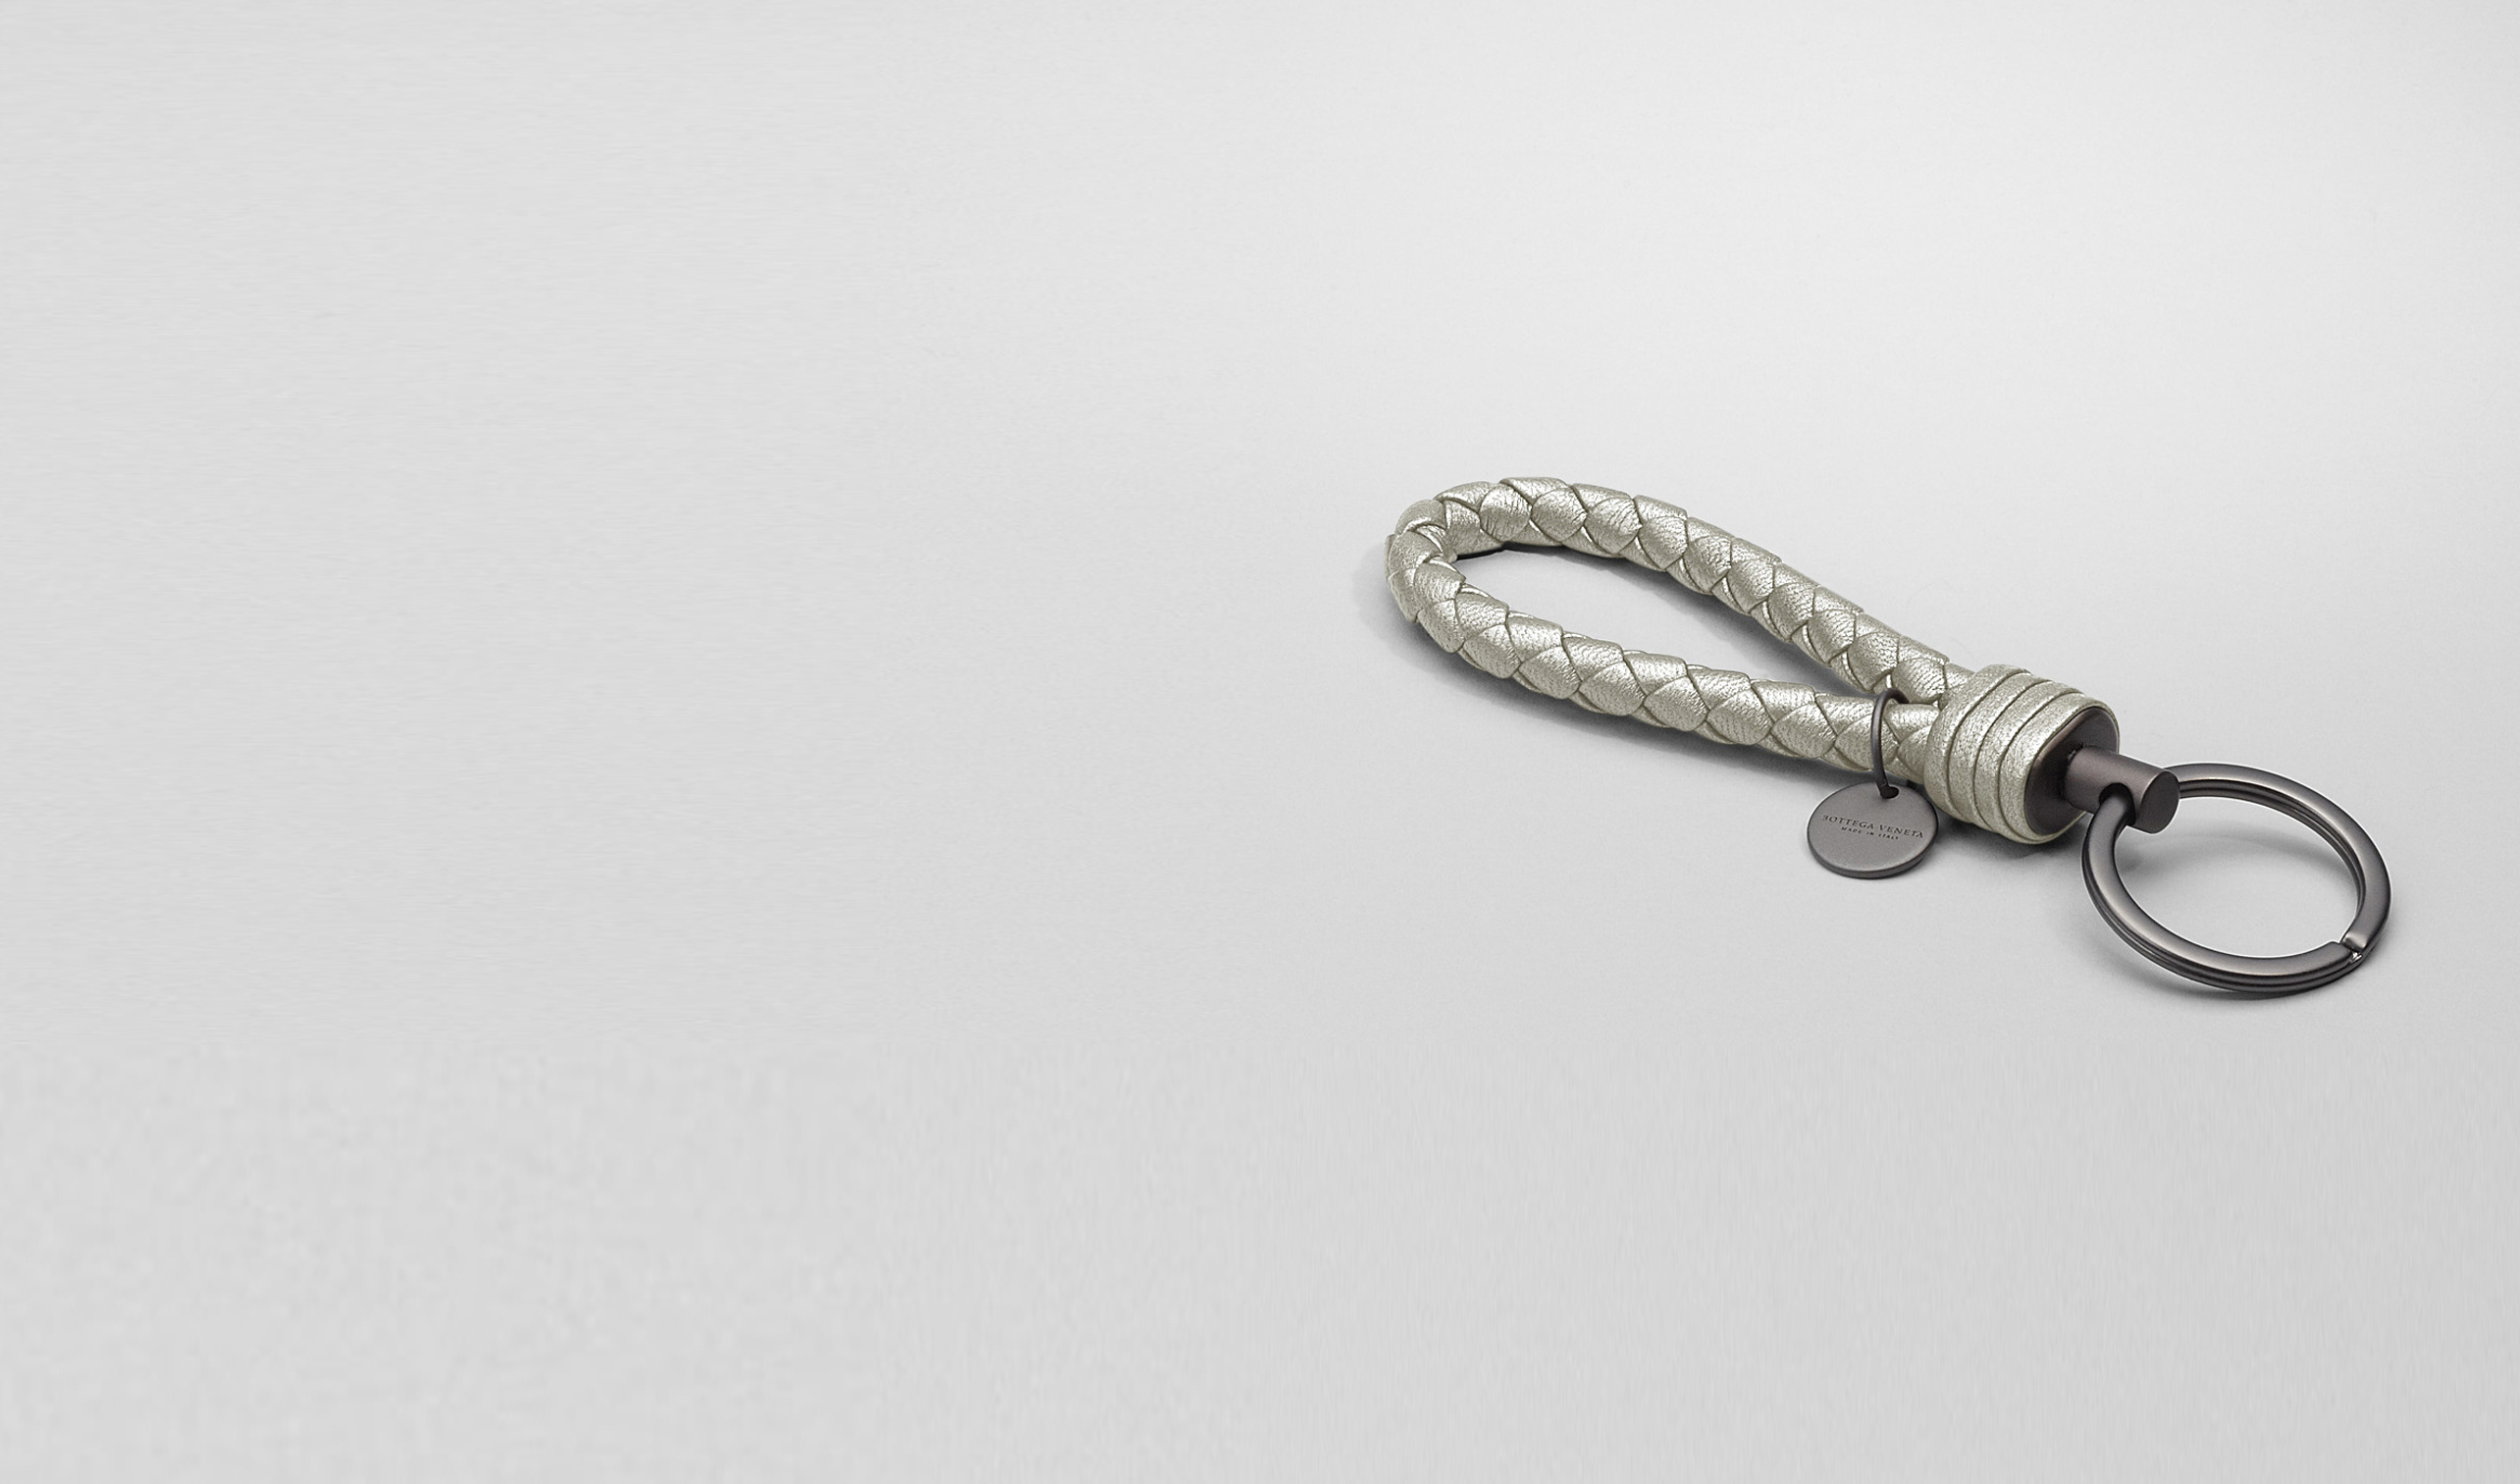 BOTTEGA VENETA Keyring or Bracelets D PLATINUM INTRECCIATO NAPPA METALLIZZATO Key Ring pl